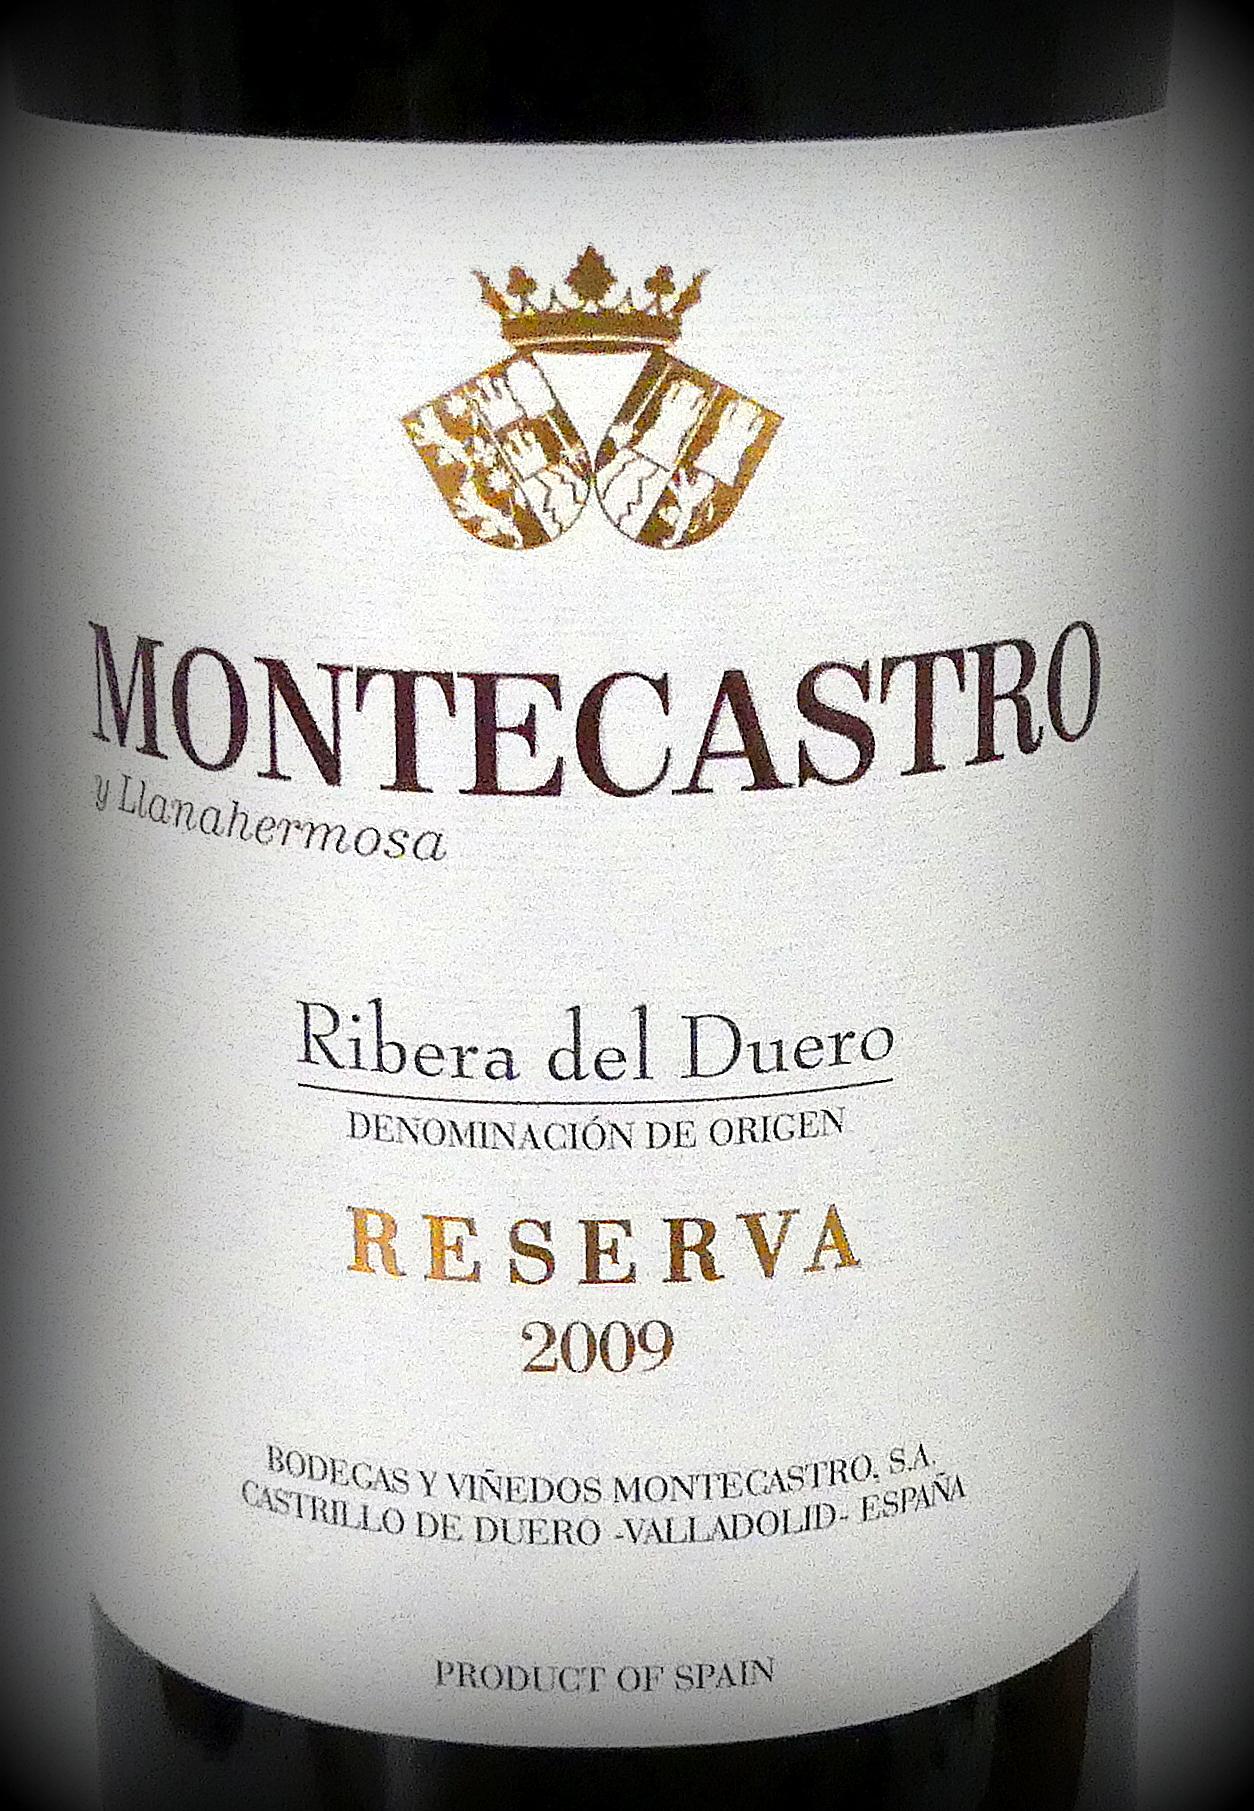 Montecastro Reserva